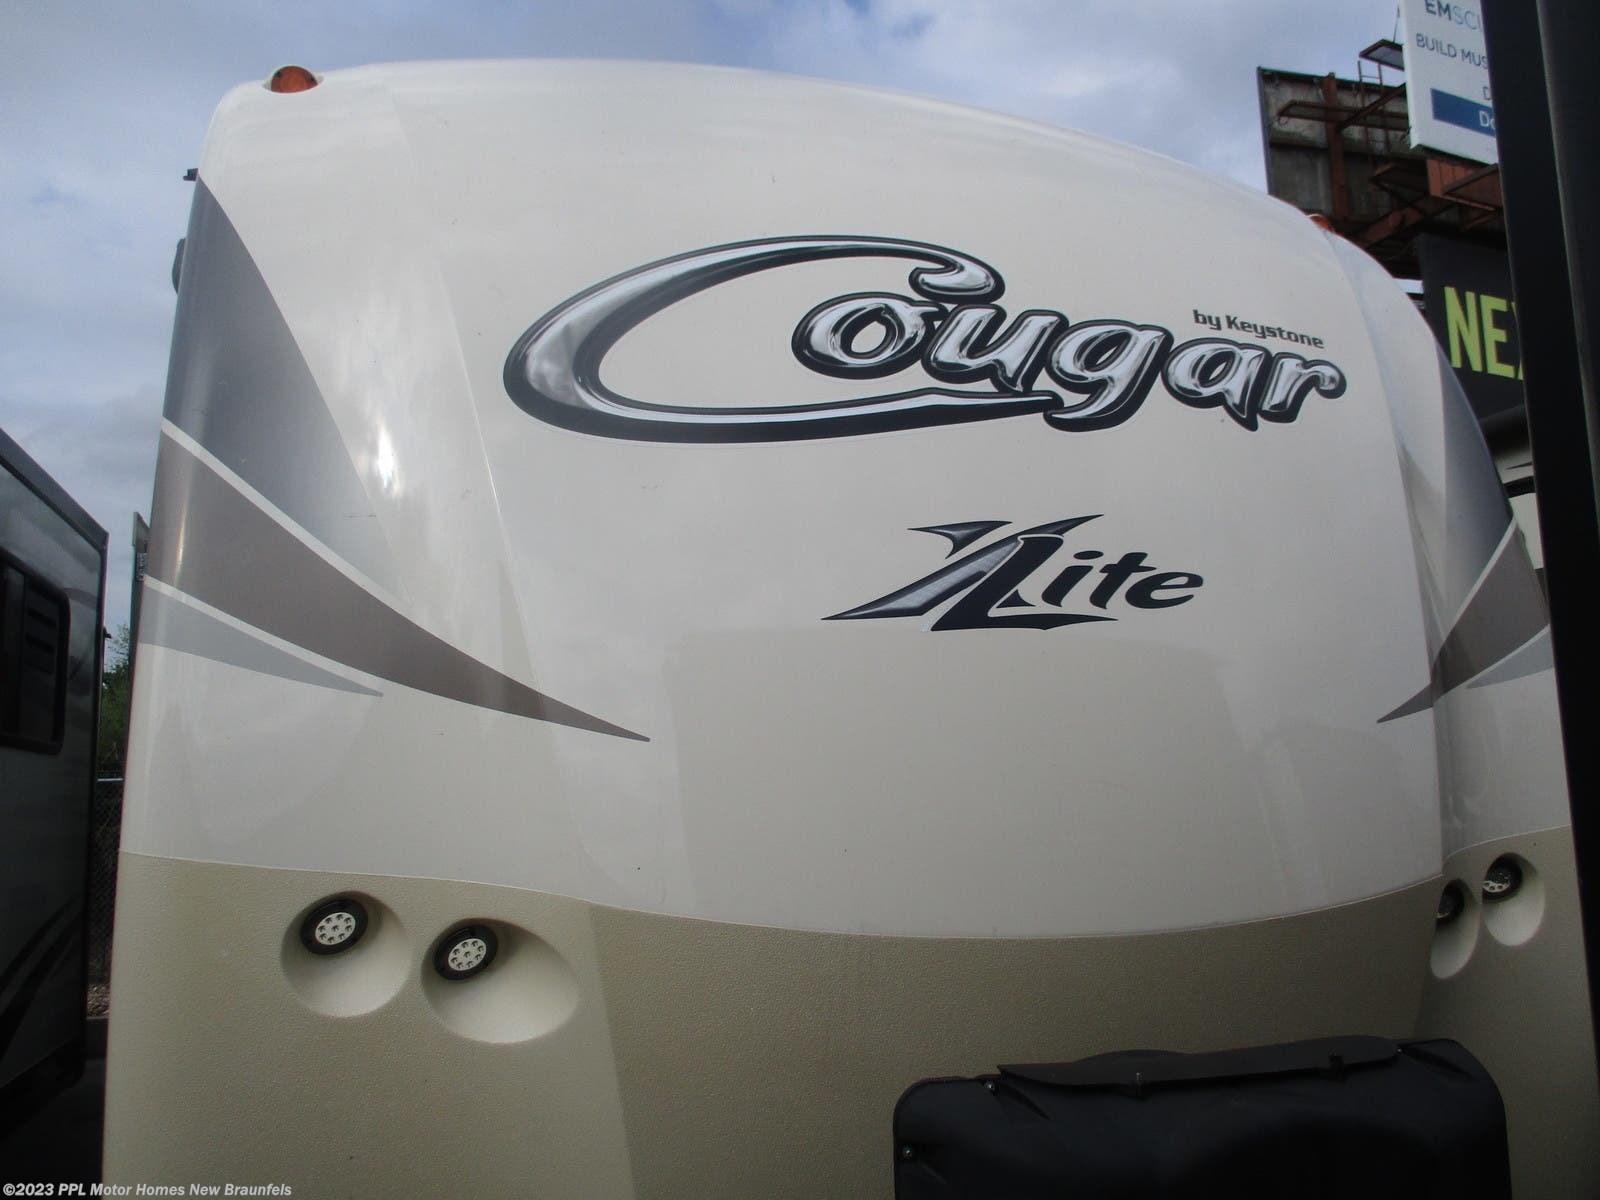 2018 Keystone RV Cougar X Lite 26RBI for Sale in New Braunfels, TX 78130 |  T118NB